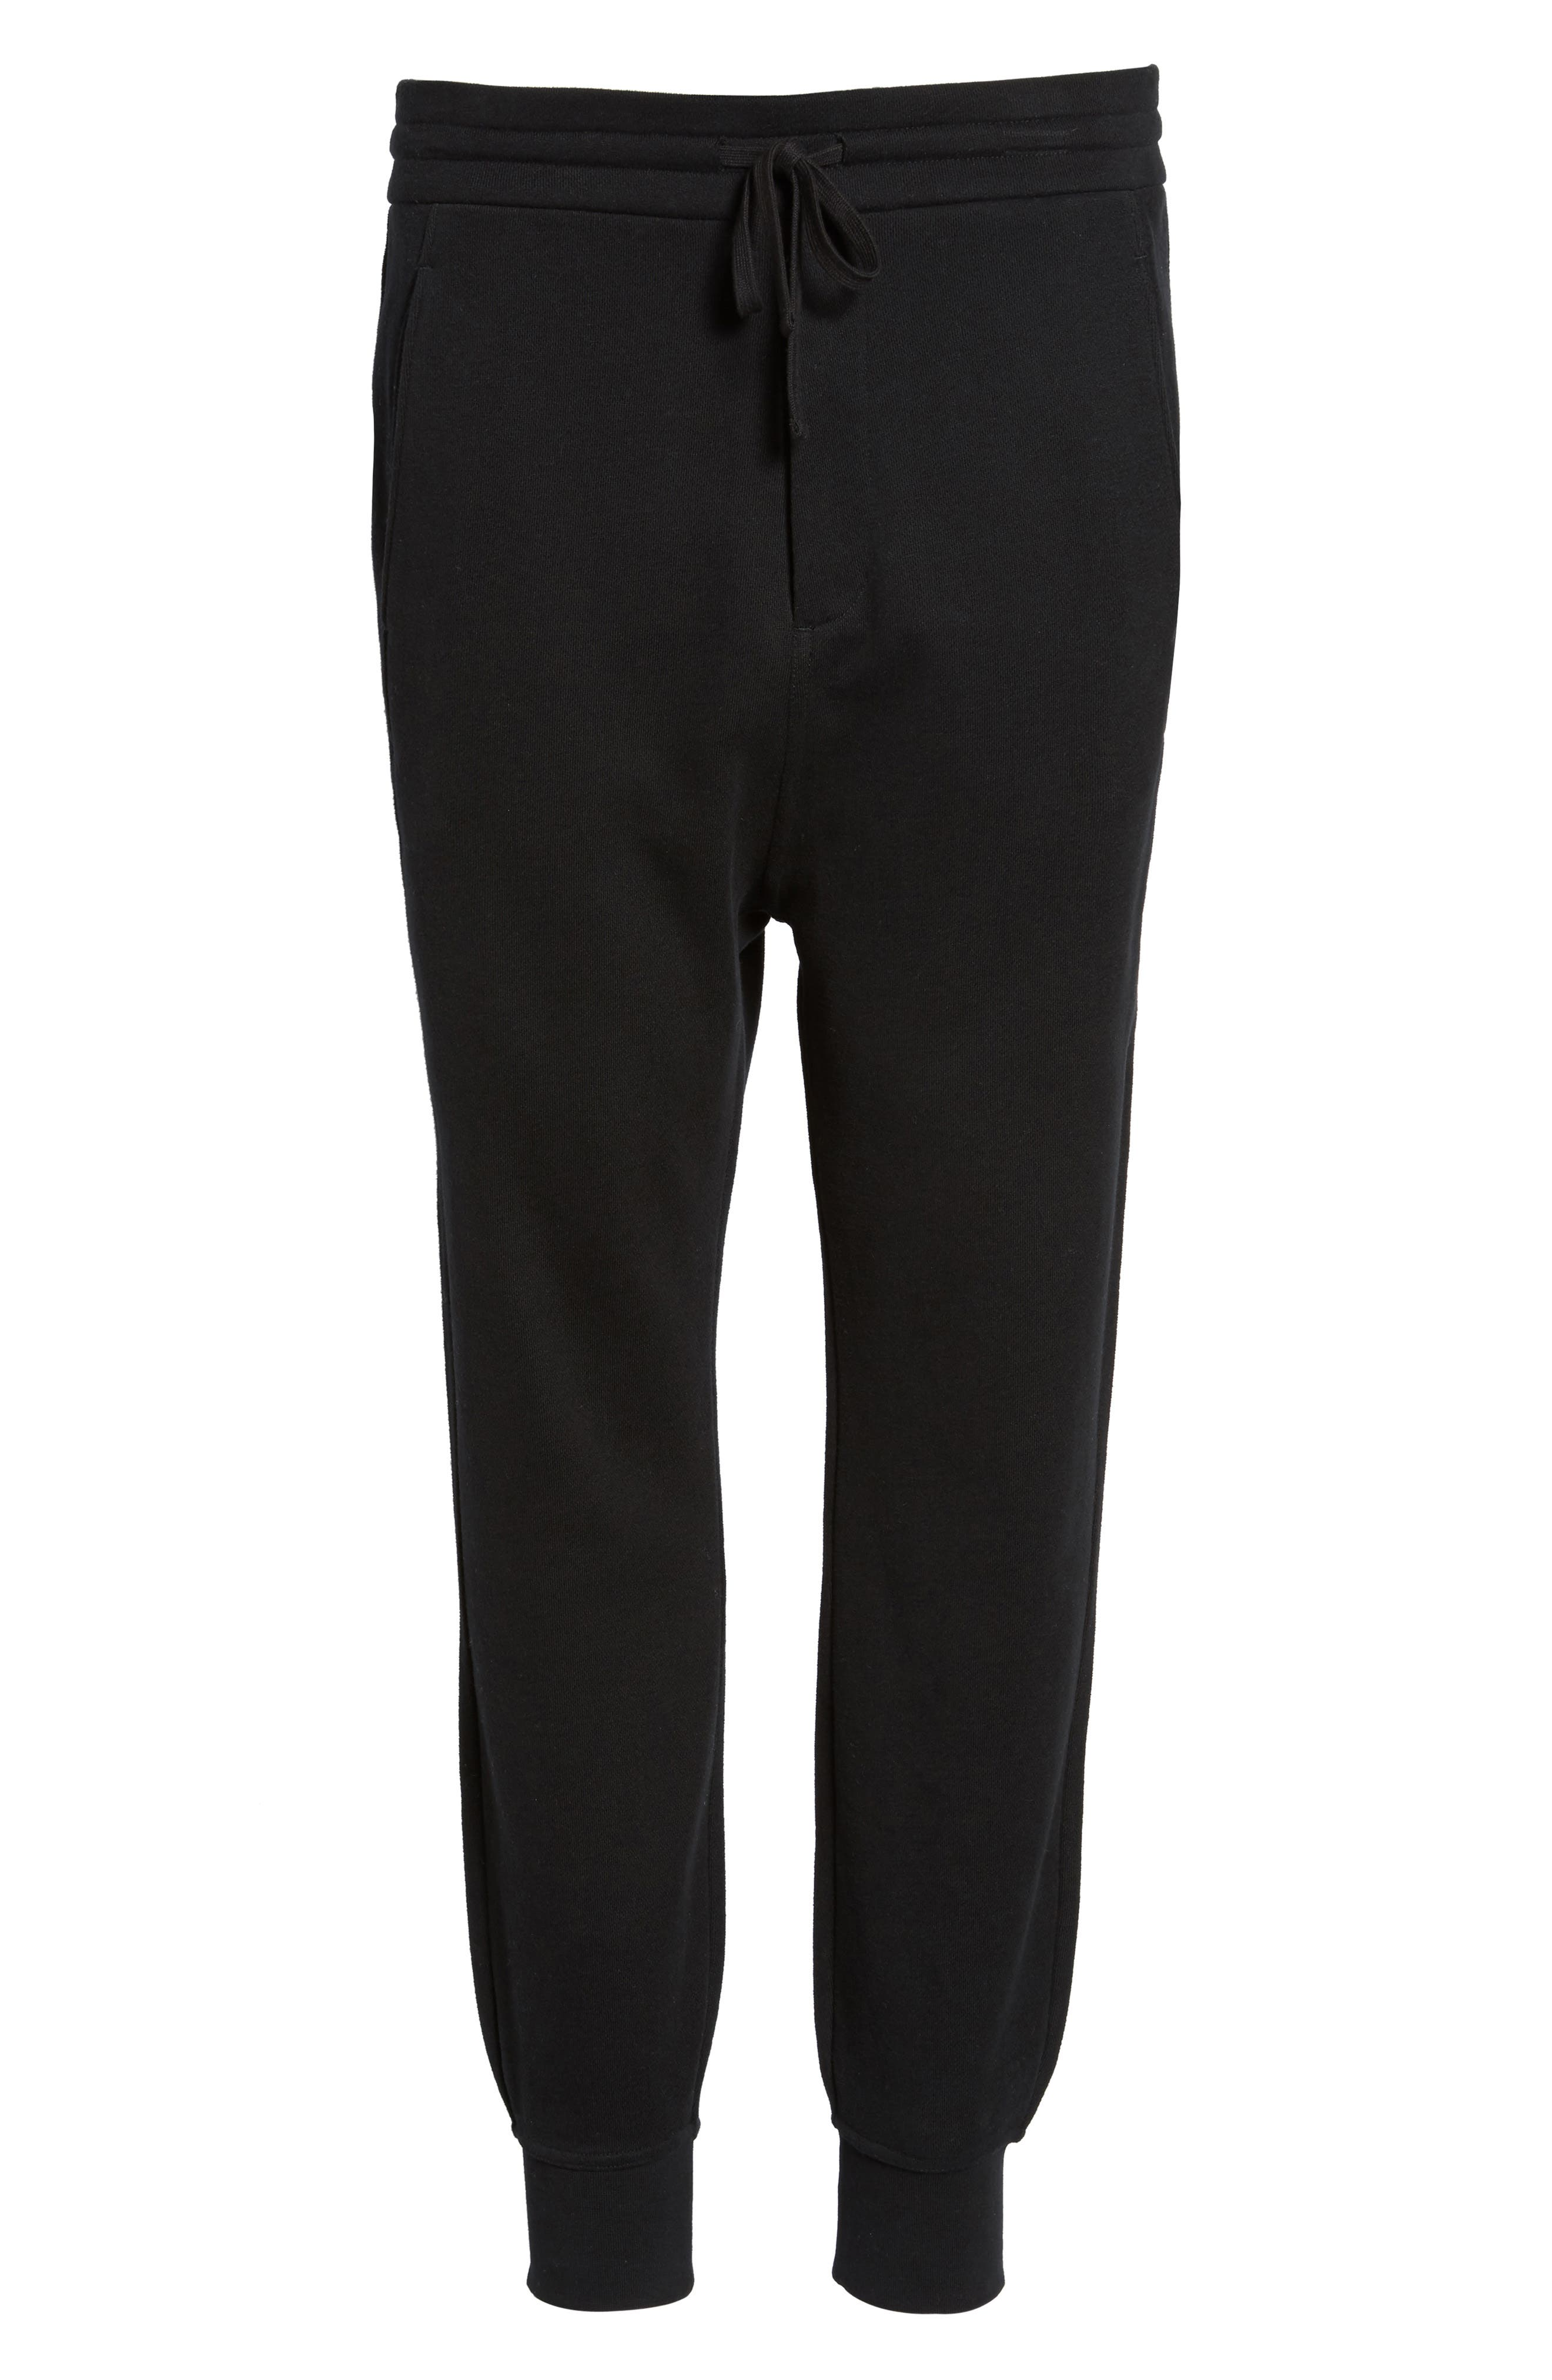 Regular Fit Sweatpants,                             Alternate thumbnail 6, color,                             Black